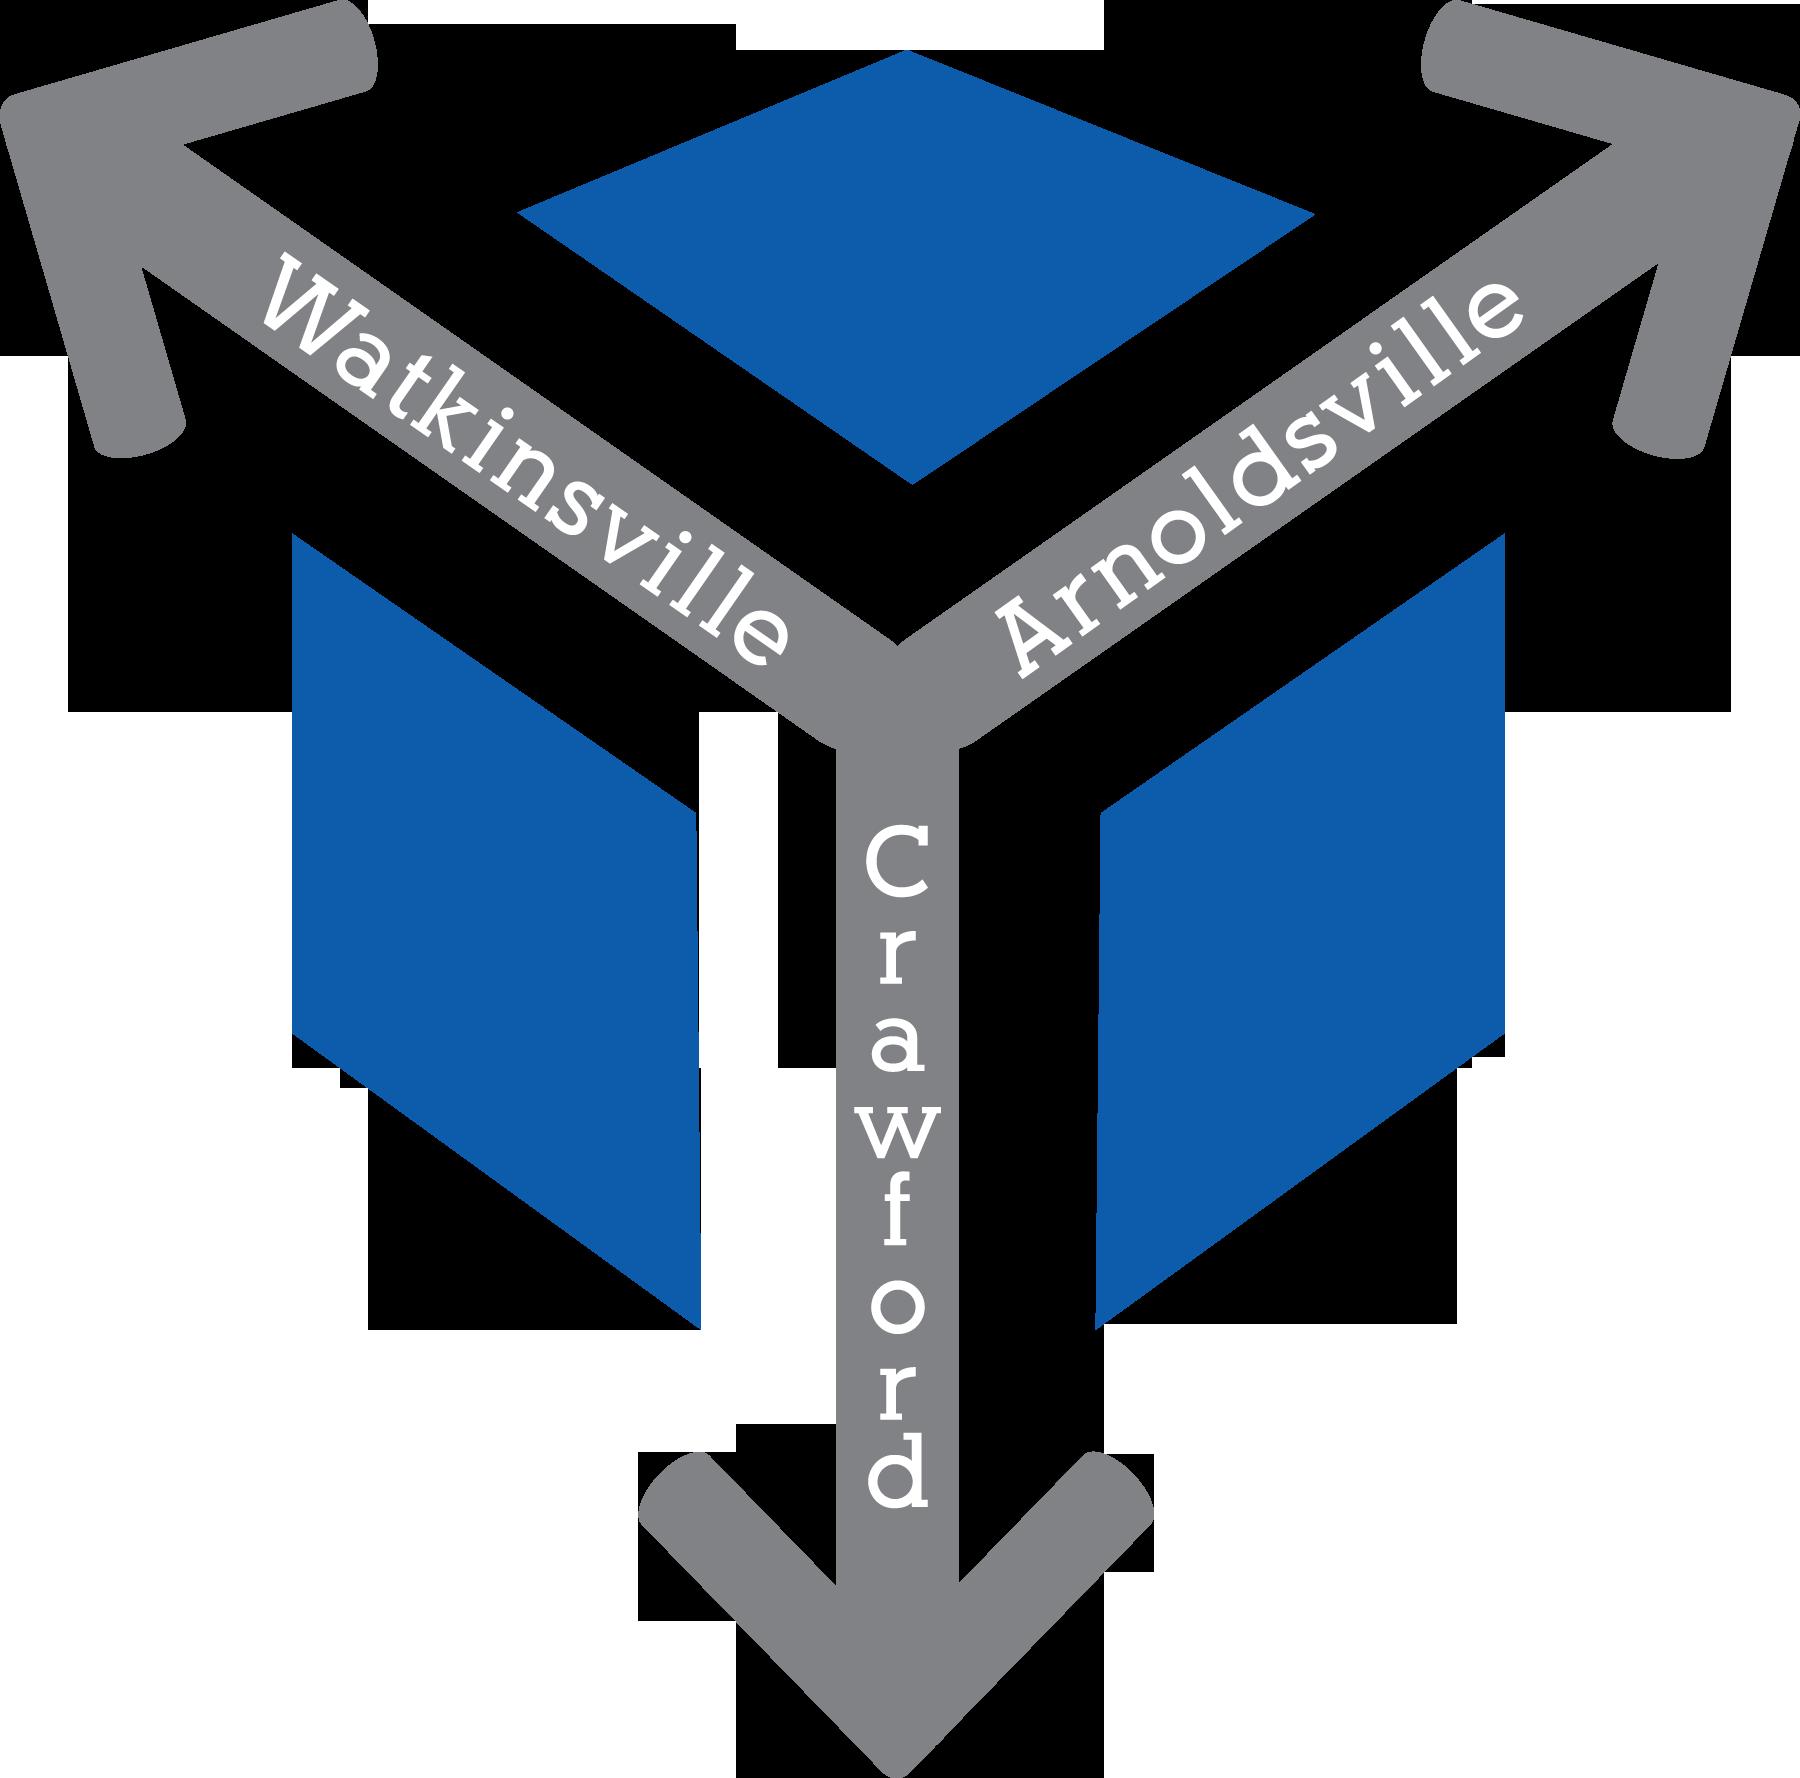 Logo for Oglethorpe Storage, click to go home